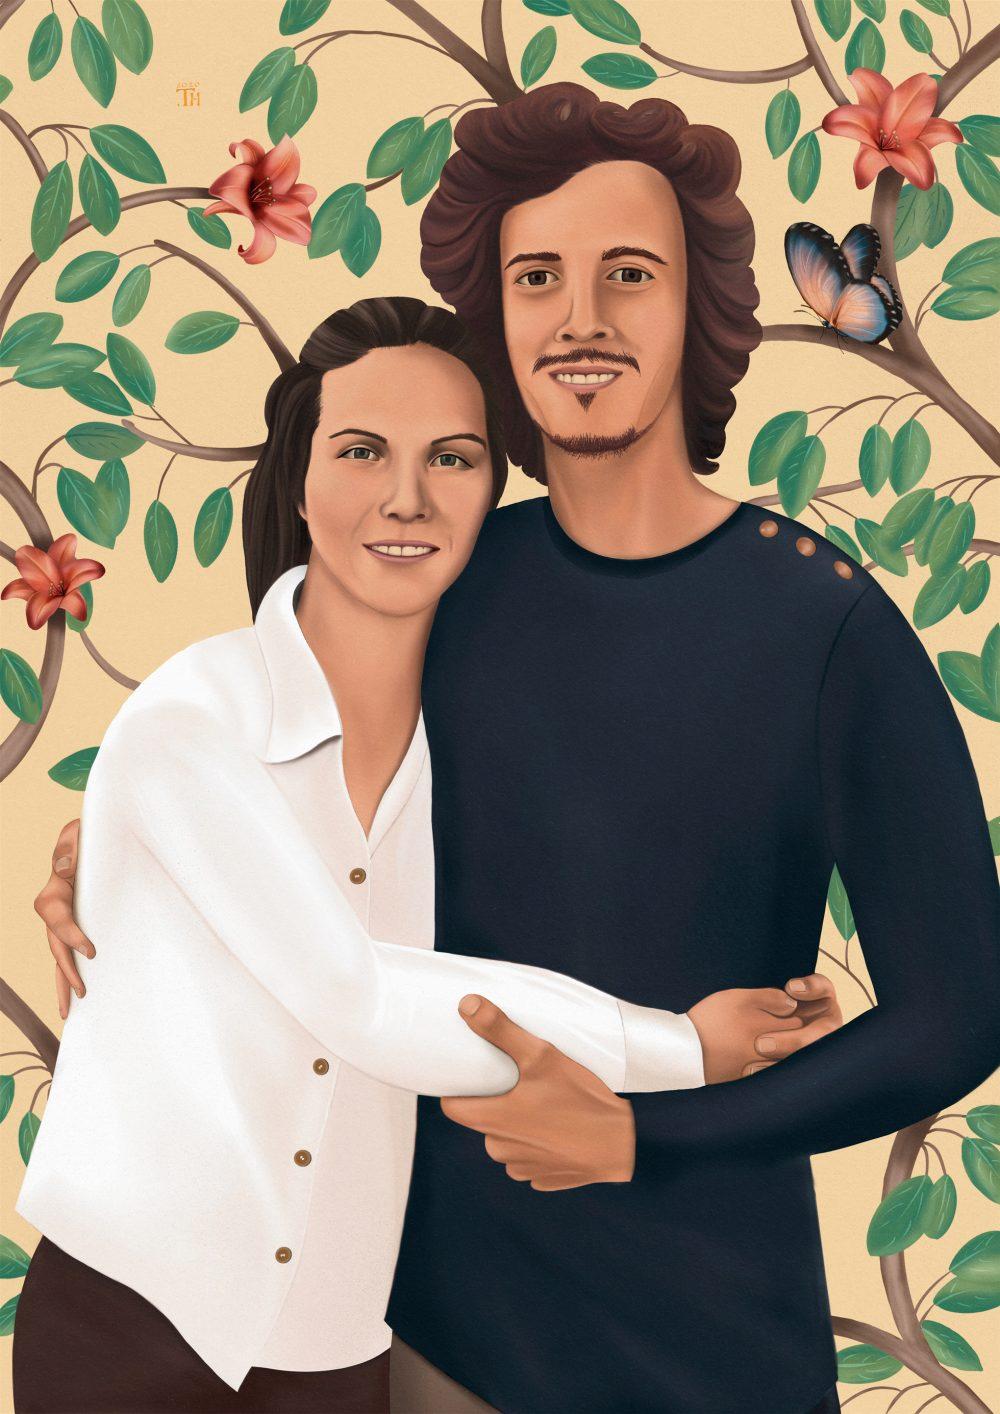 Alice & Agustin - Digital Painting - Thibault Herlédan